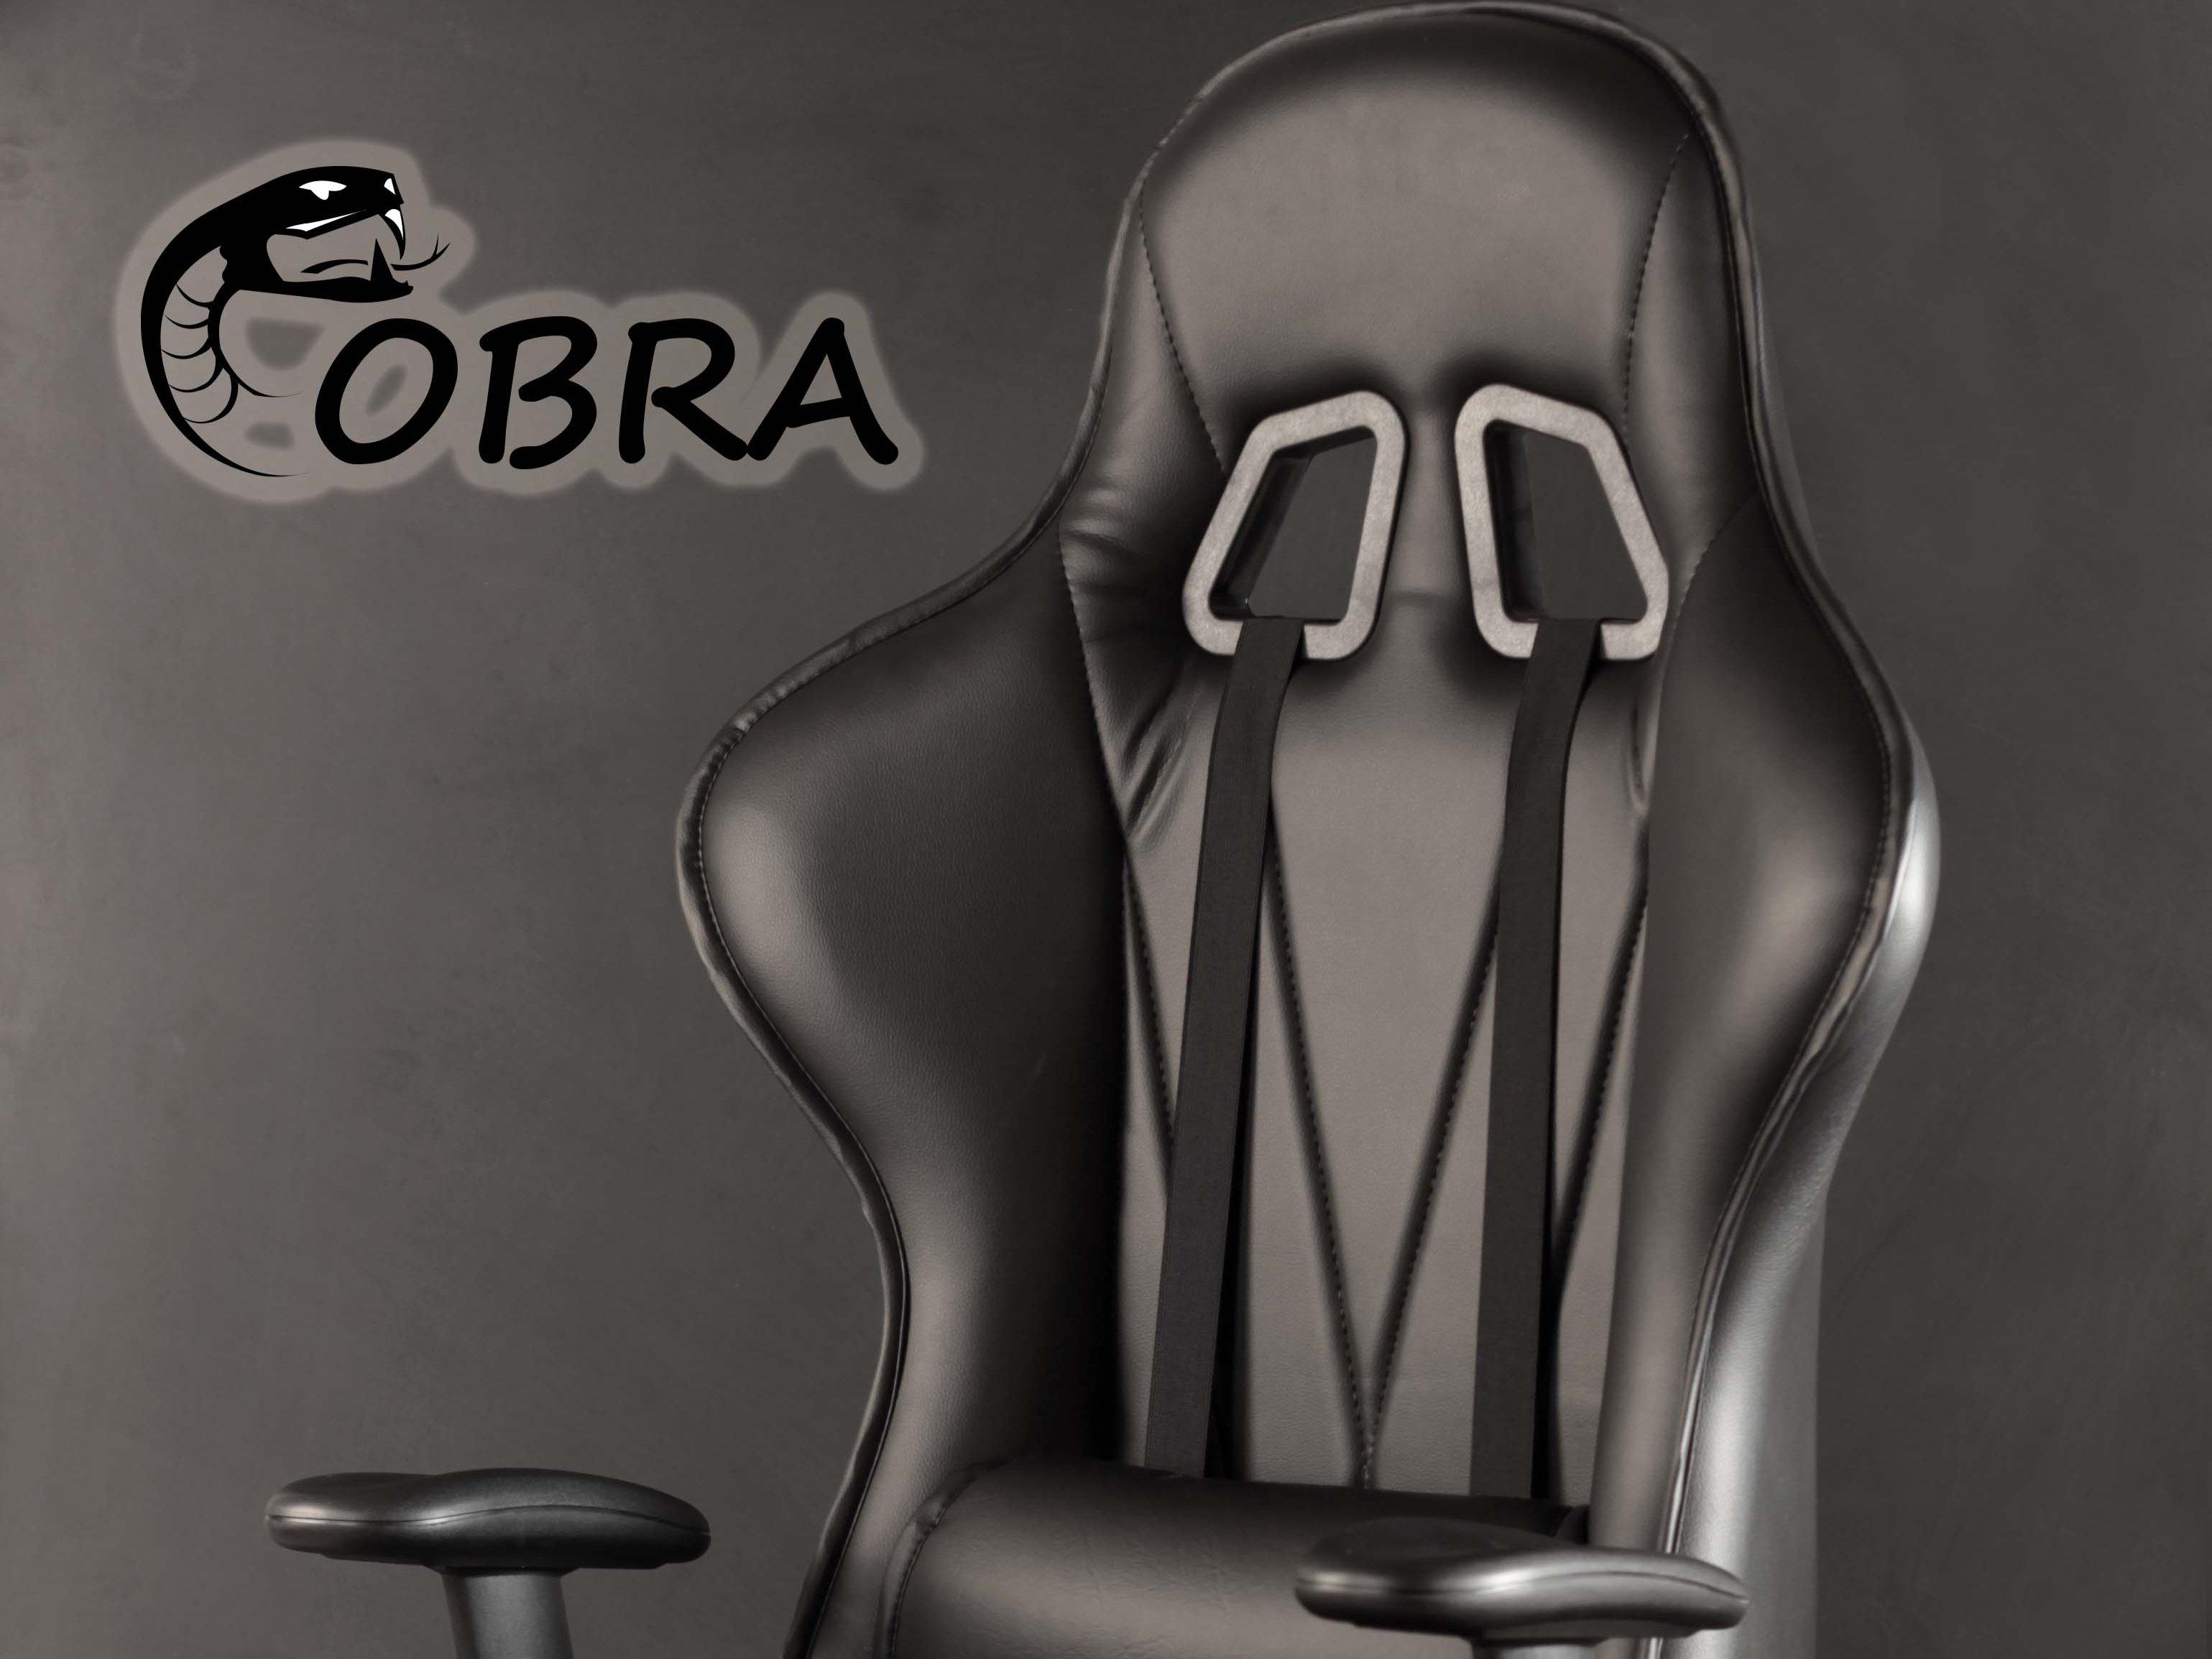 كرسي كوبرا